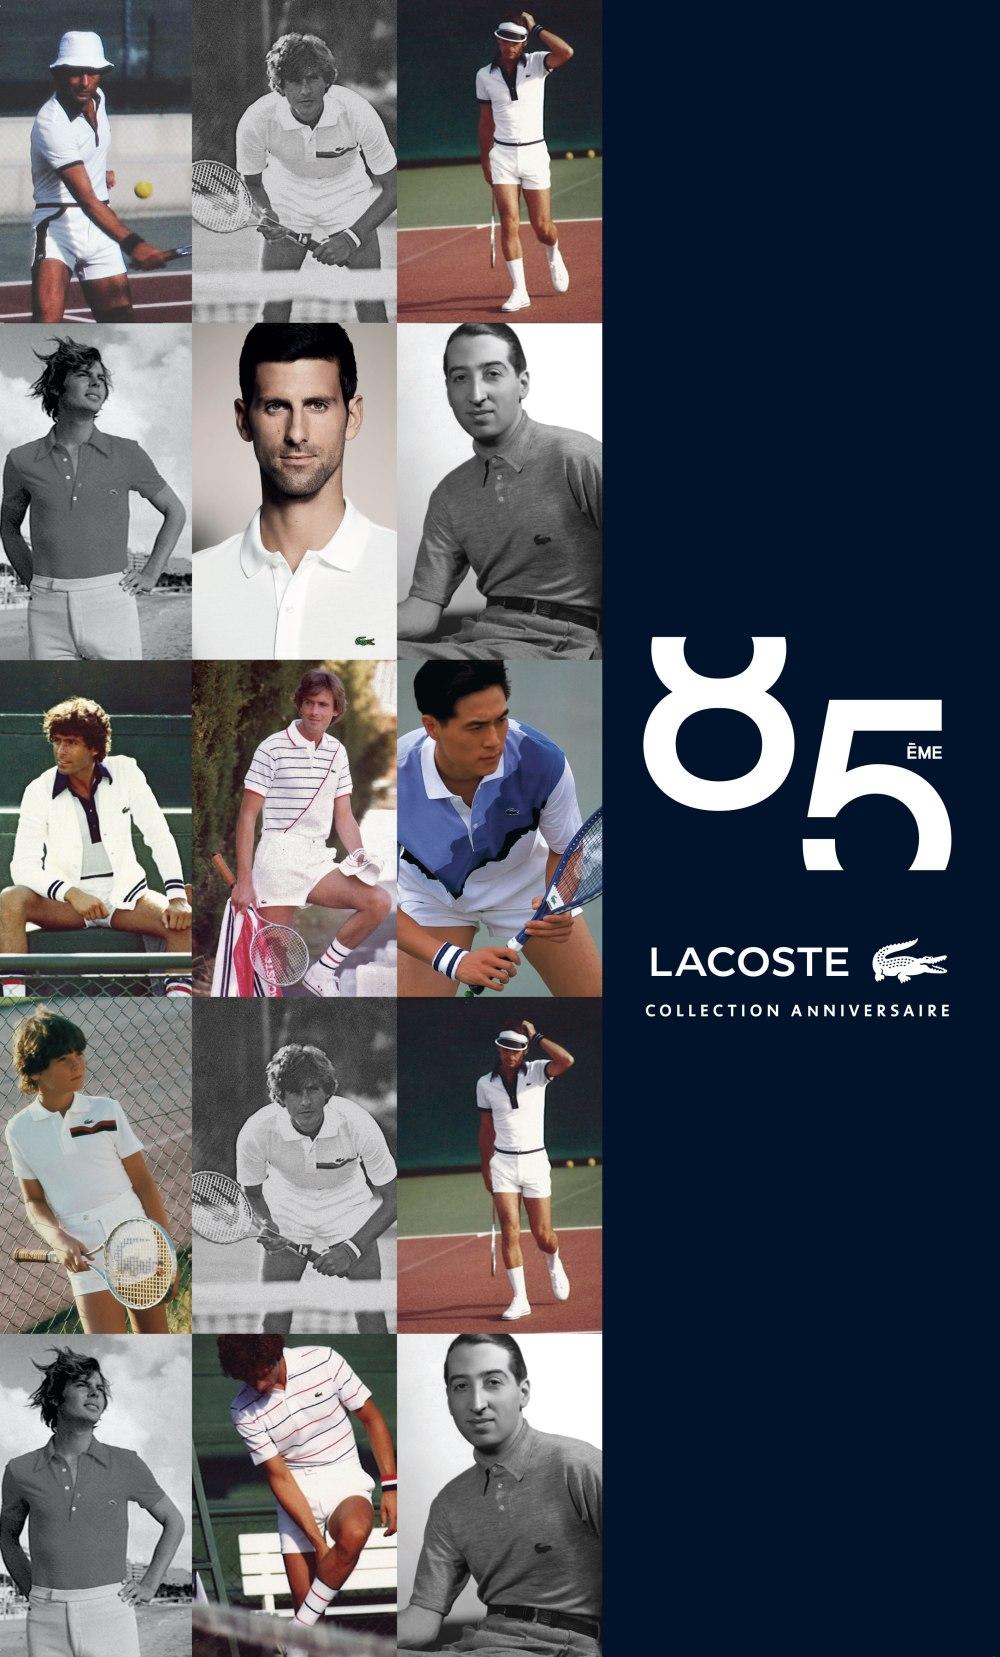 LACOSTE-85